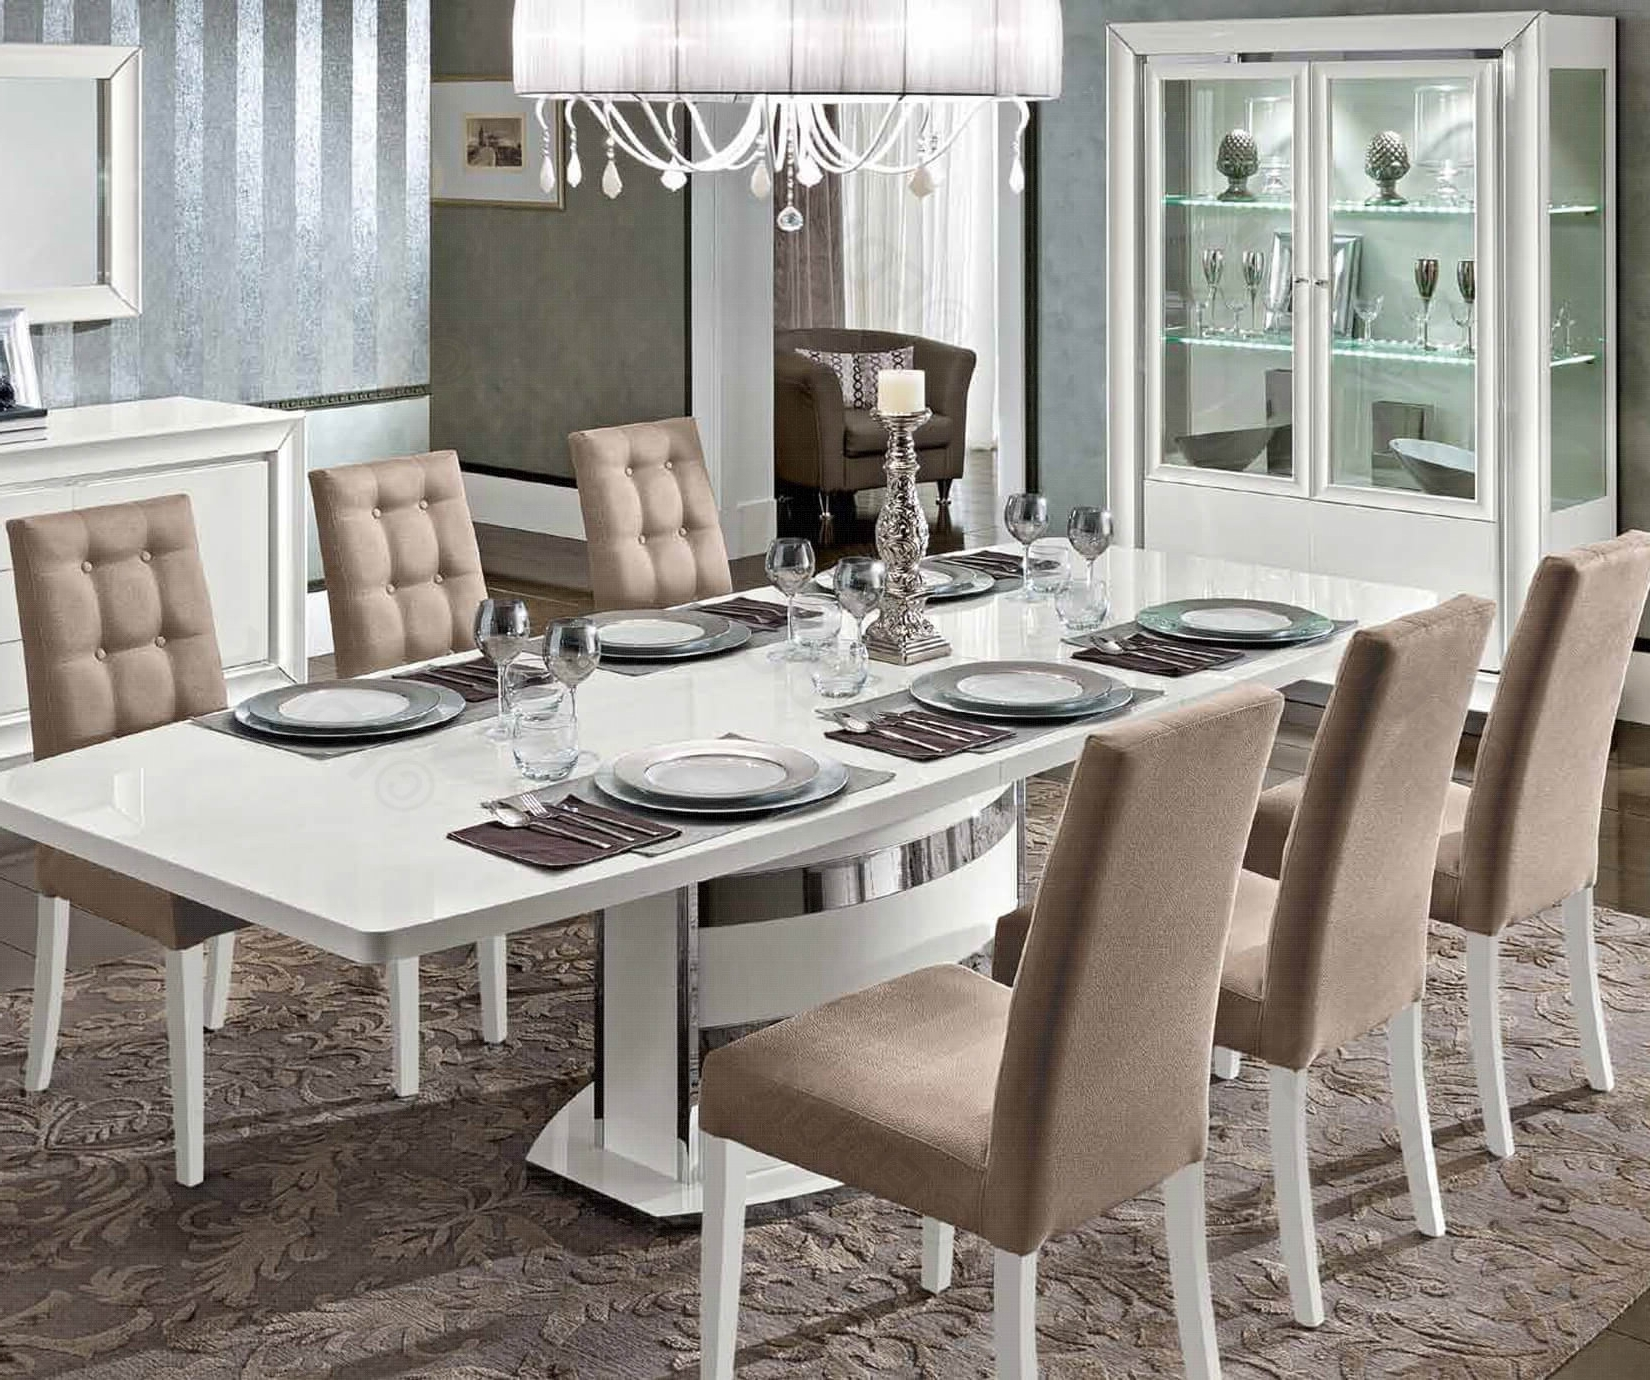 Dama Bianca White High Gloss Extending Pertaining To Recent High Gloss Extending Dining Tables (Gallery 2 of 25)